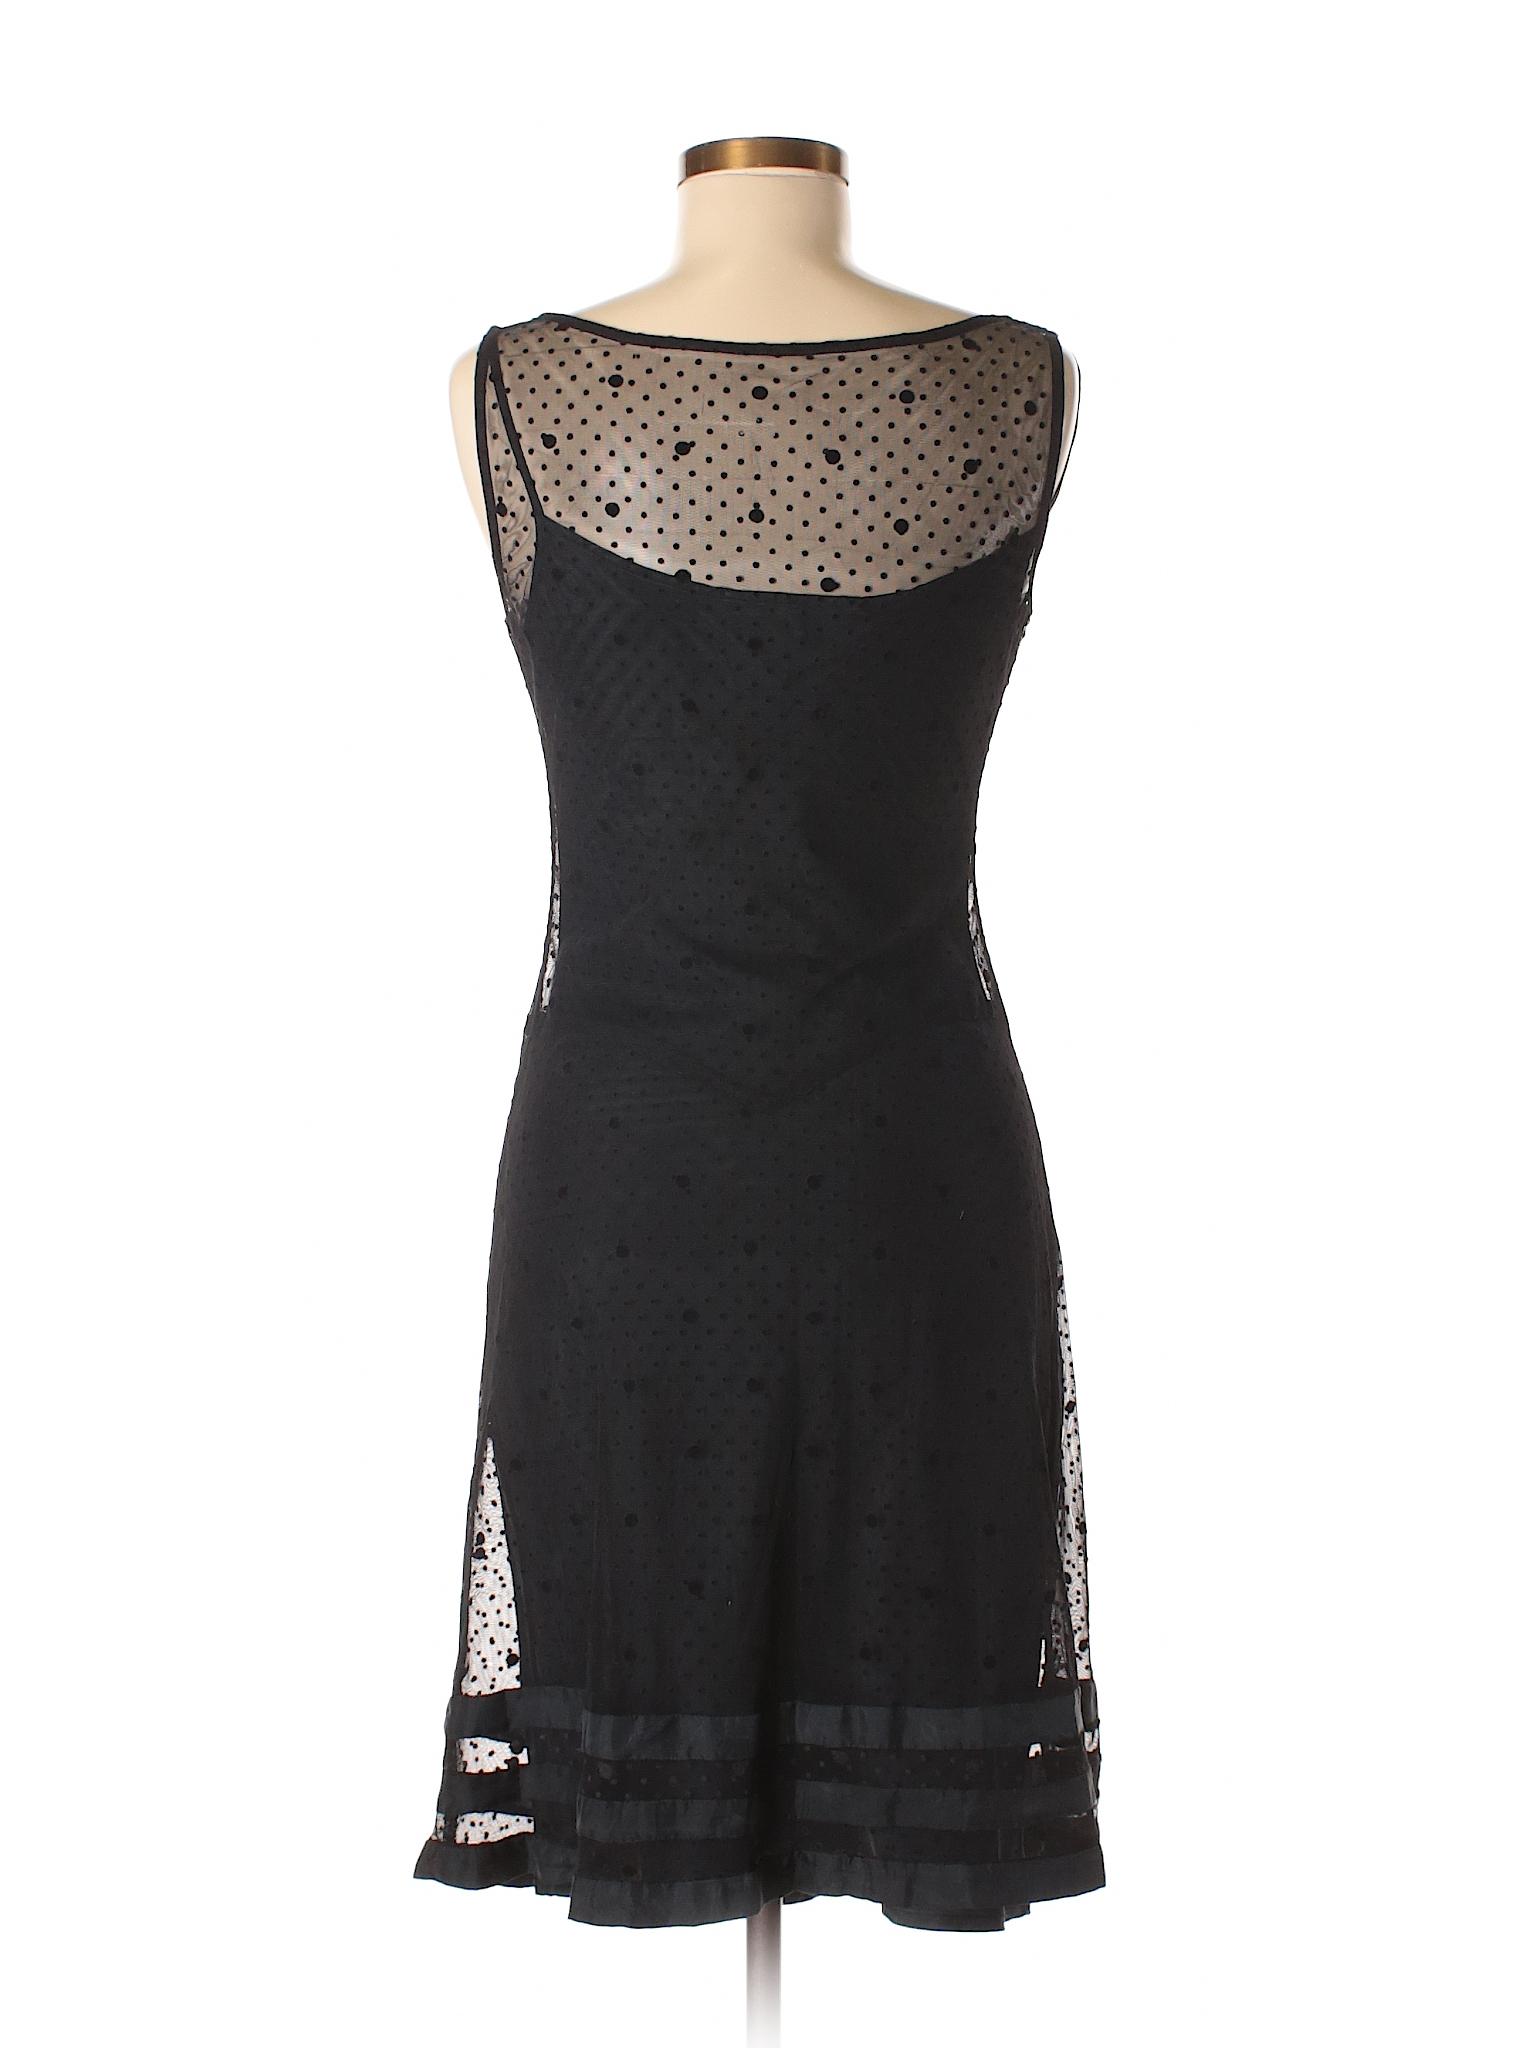 winter Dress Boutique Casual Marc Jacobs SddwgqZ